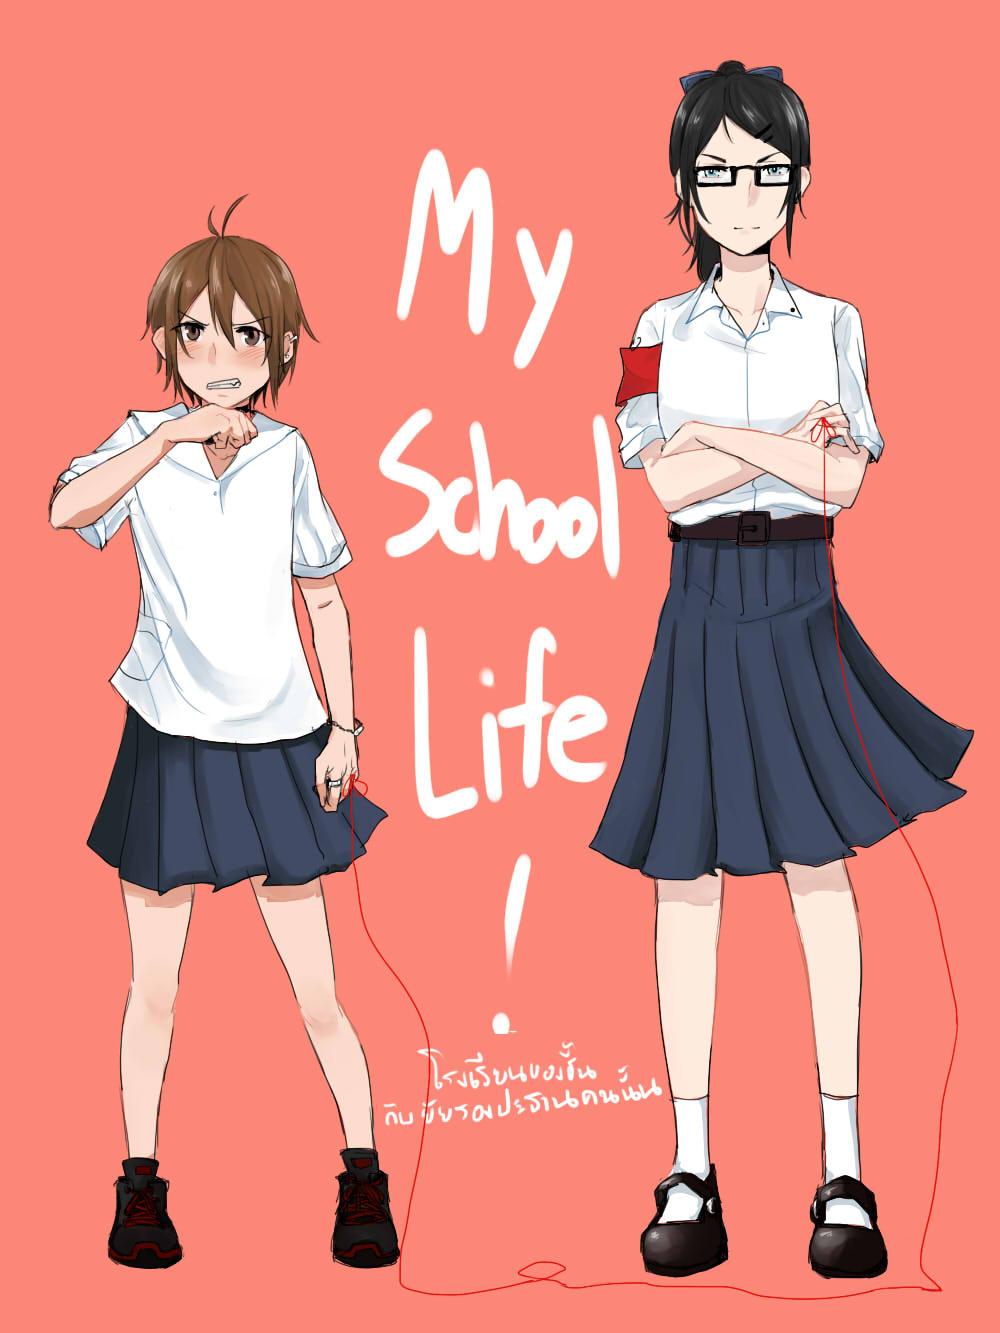 My School Life! โรงเรียนของชั้นกับยัยประธานคนนั้น